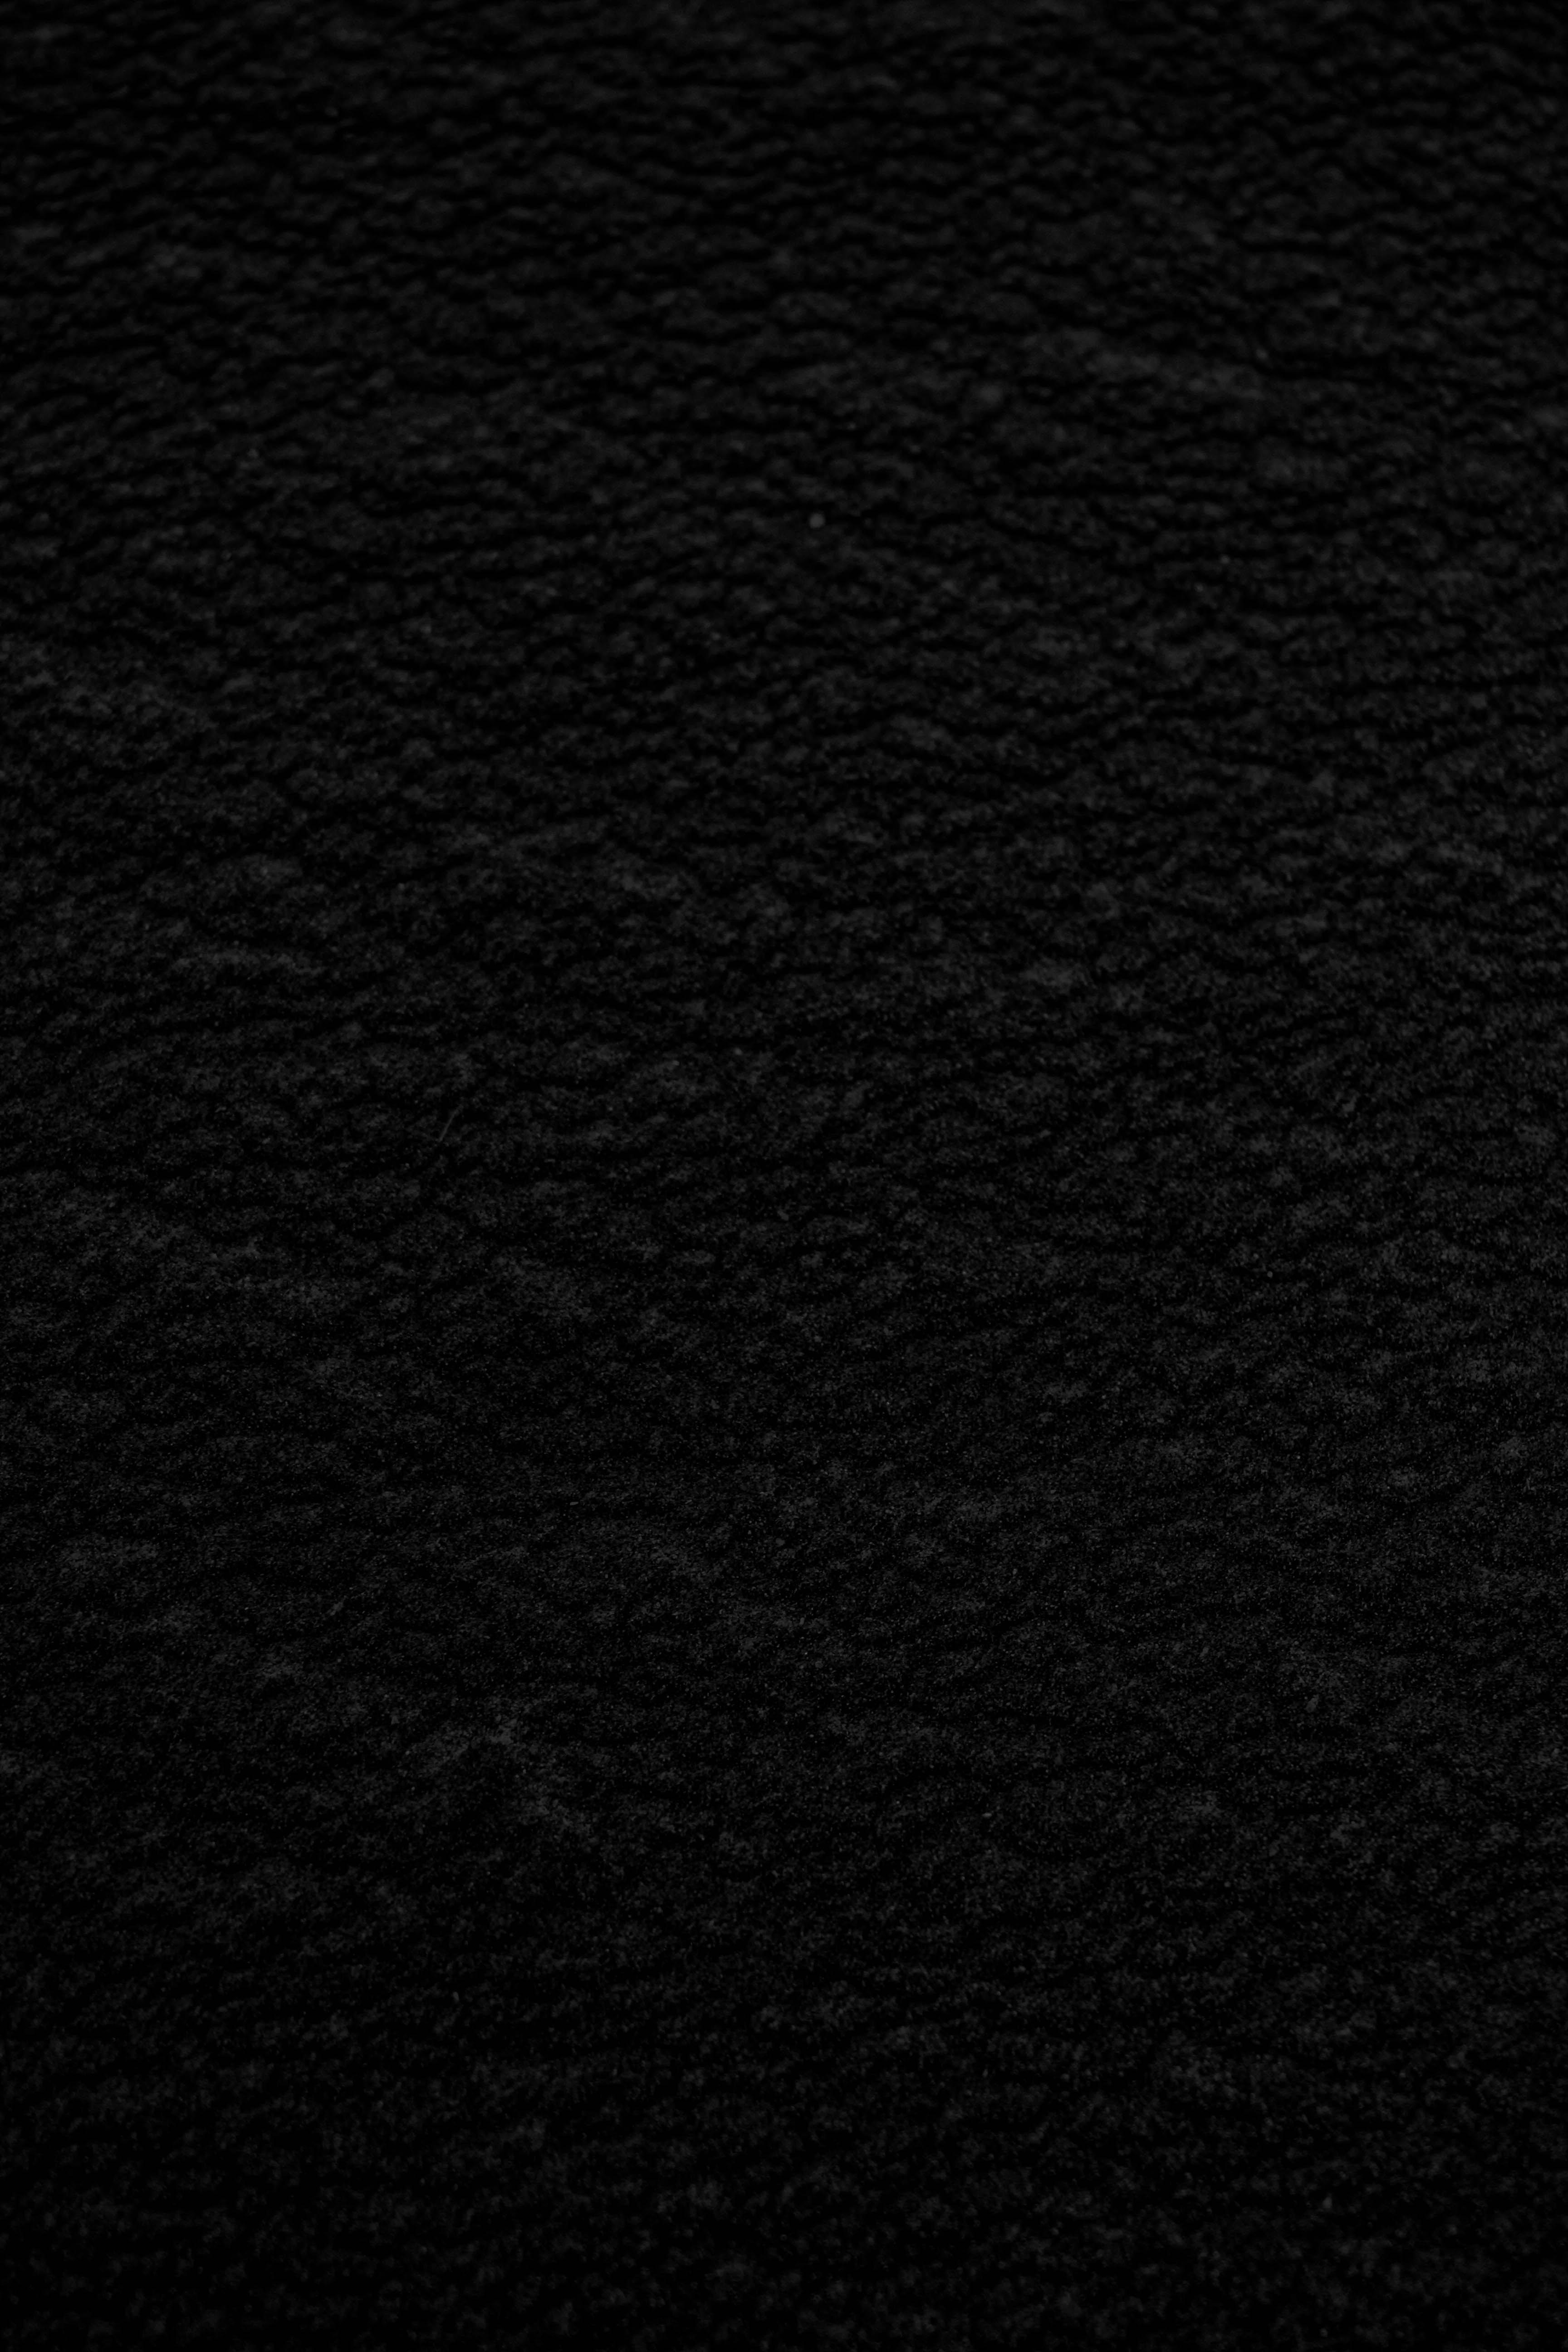 Black Wallpapers: Free HD Download